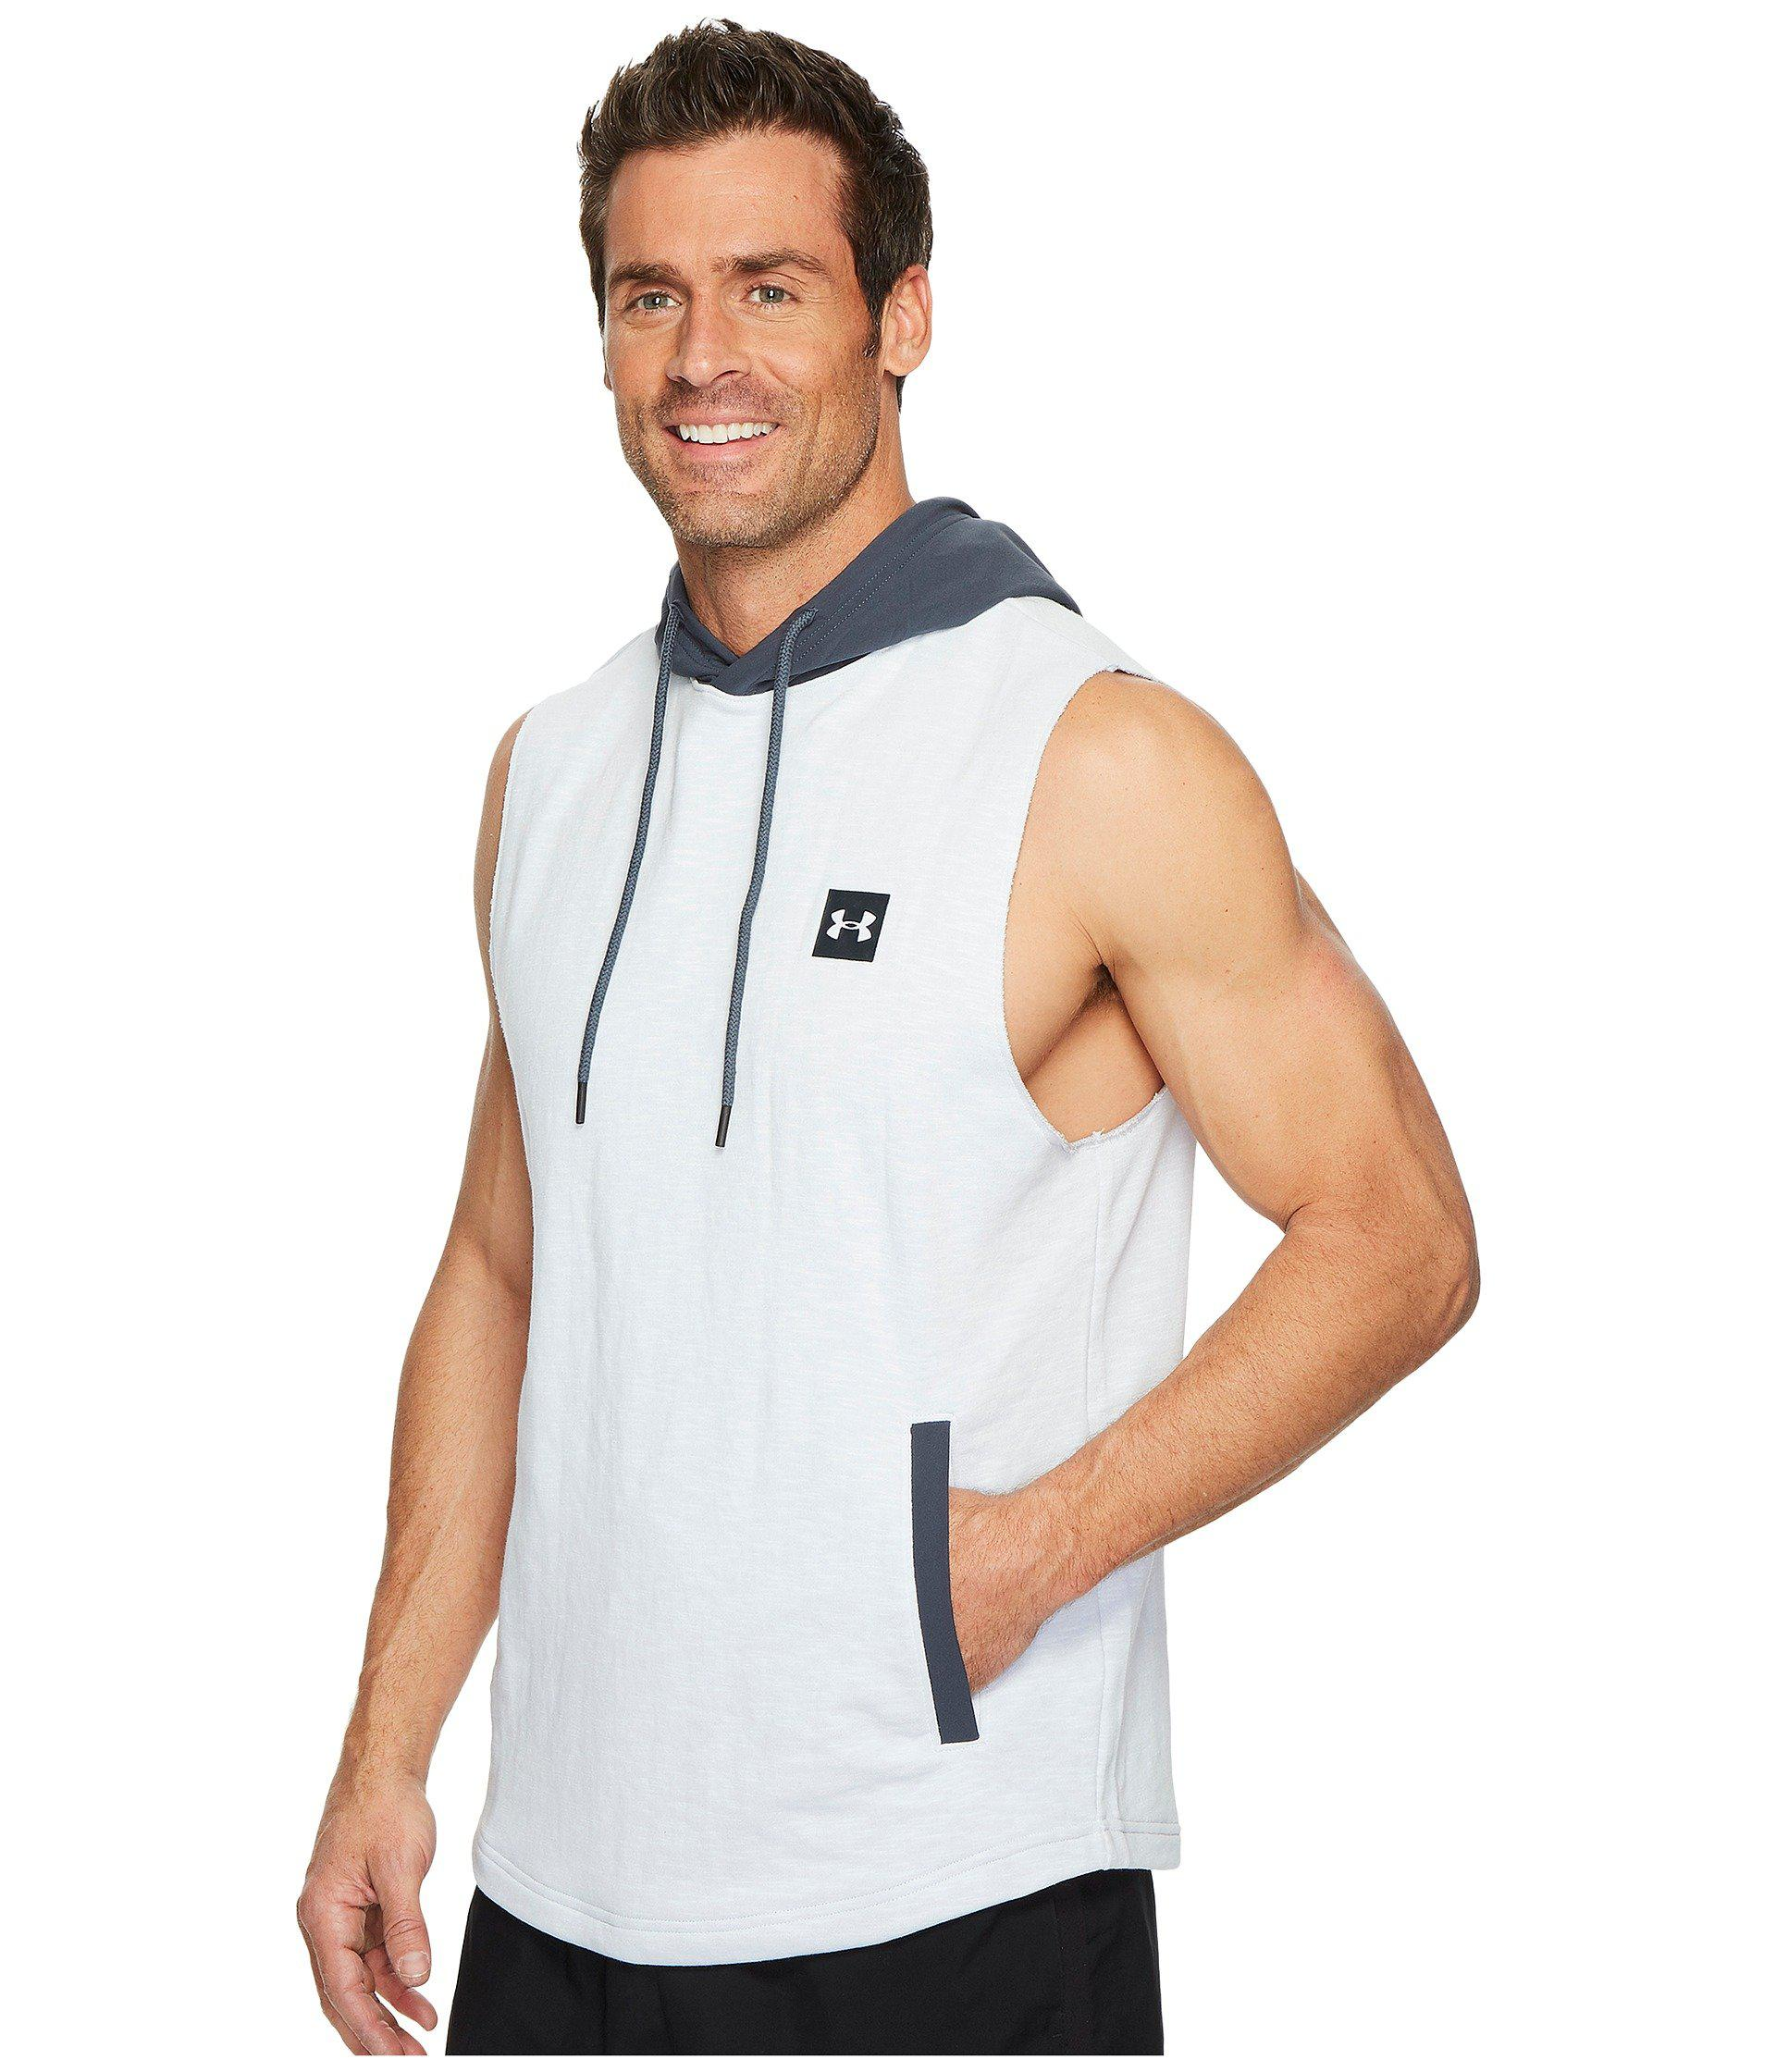 Under Armour Mens Sportstyle sleeveleshort Sleeve Hoodie